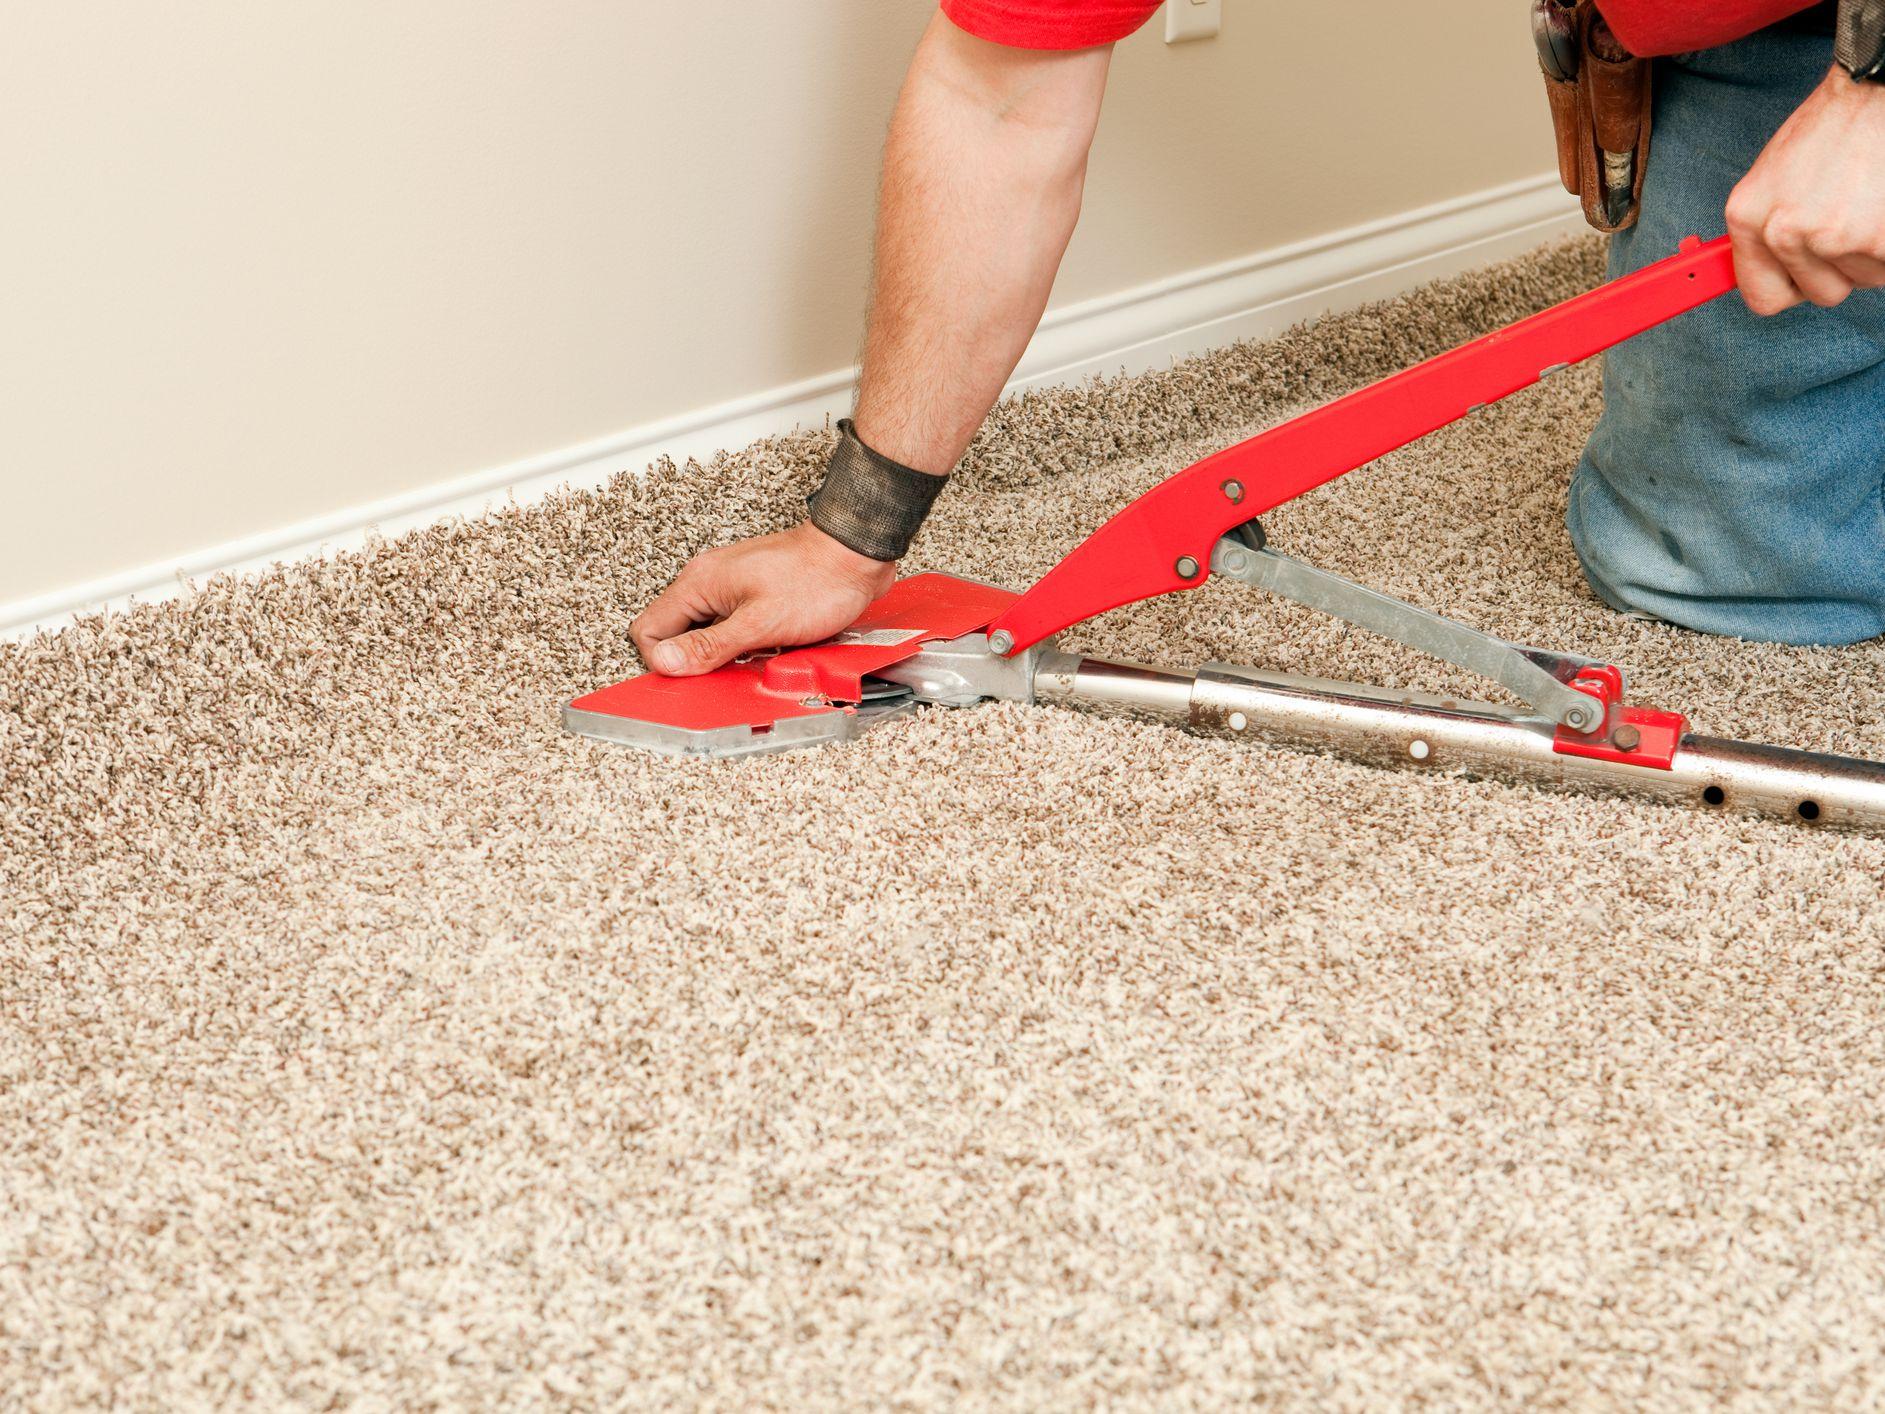 How To Put Carpet Down Without Tack Strips Carpet Vidalondon